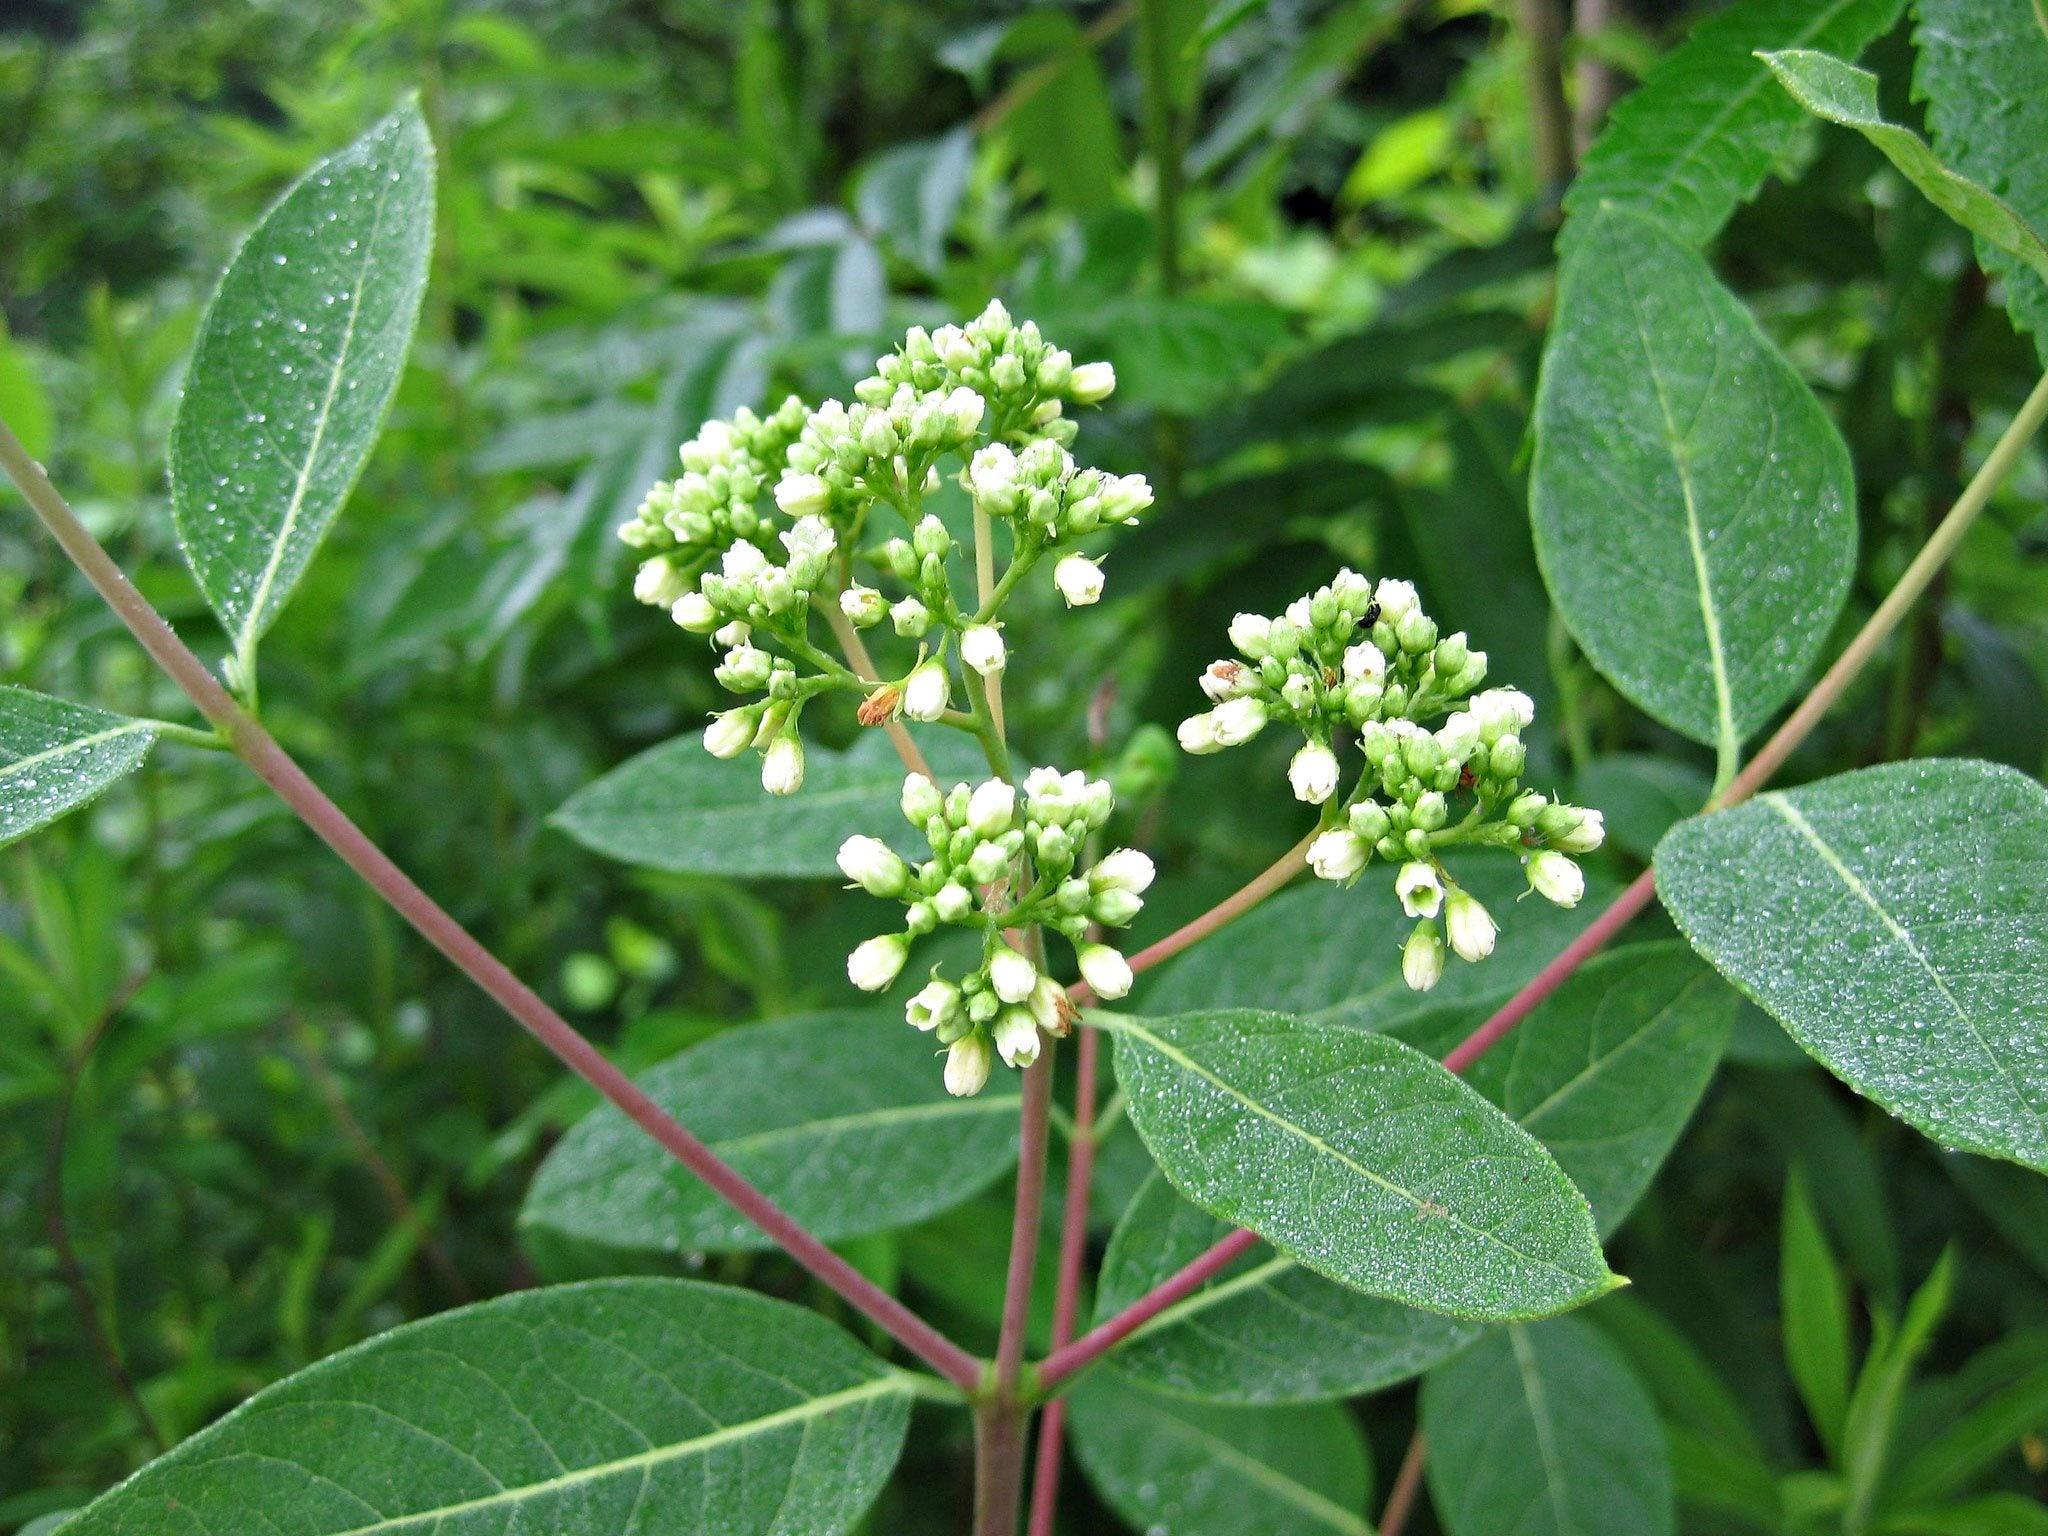 dogbane control � tips on getting rid of hemp dogbane weeds